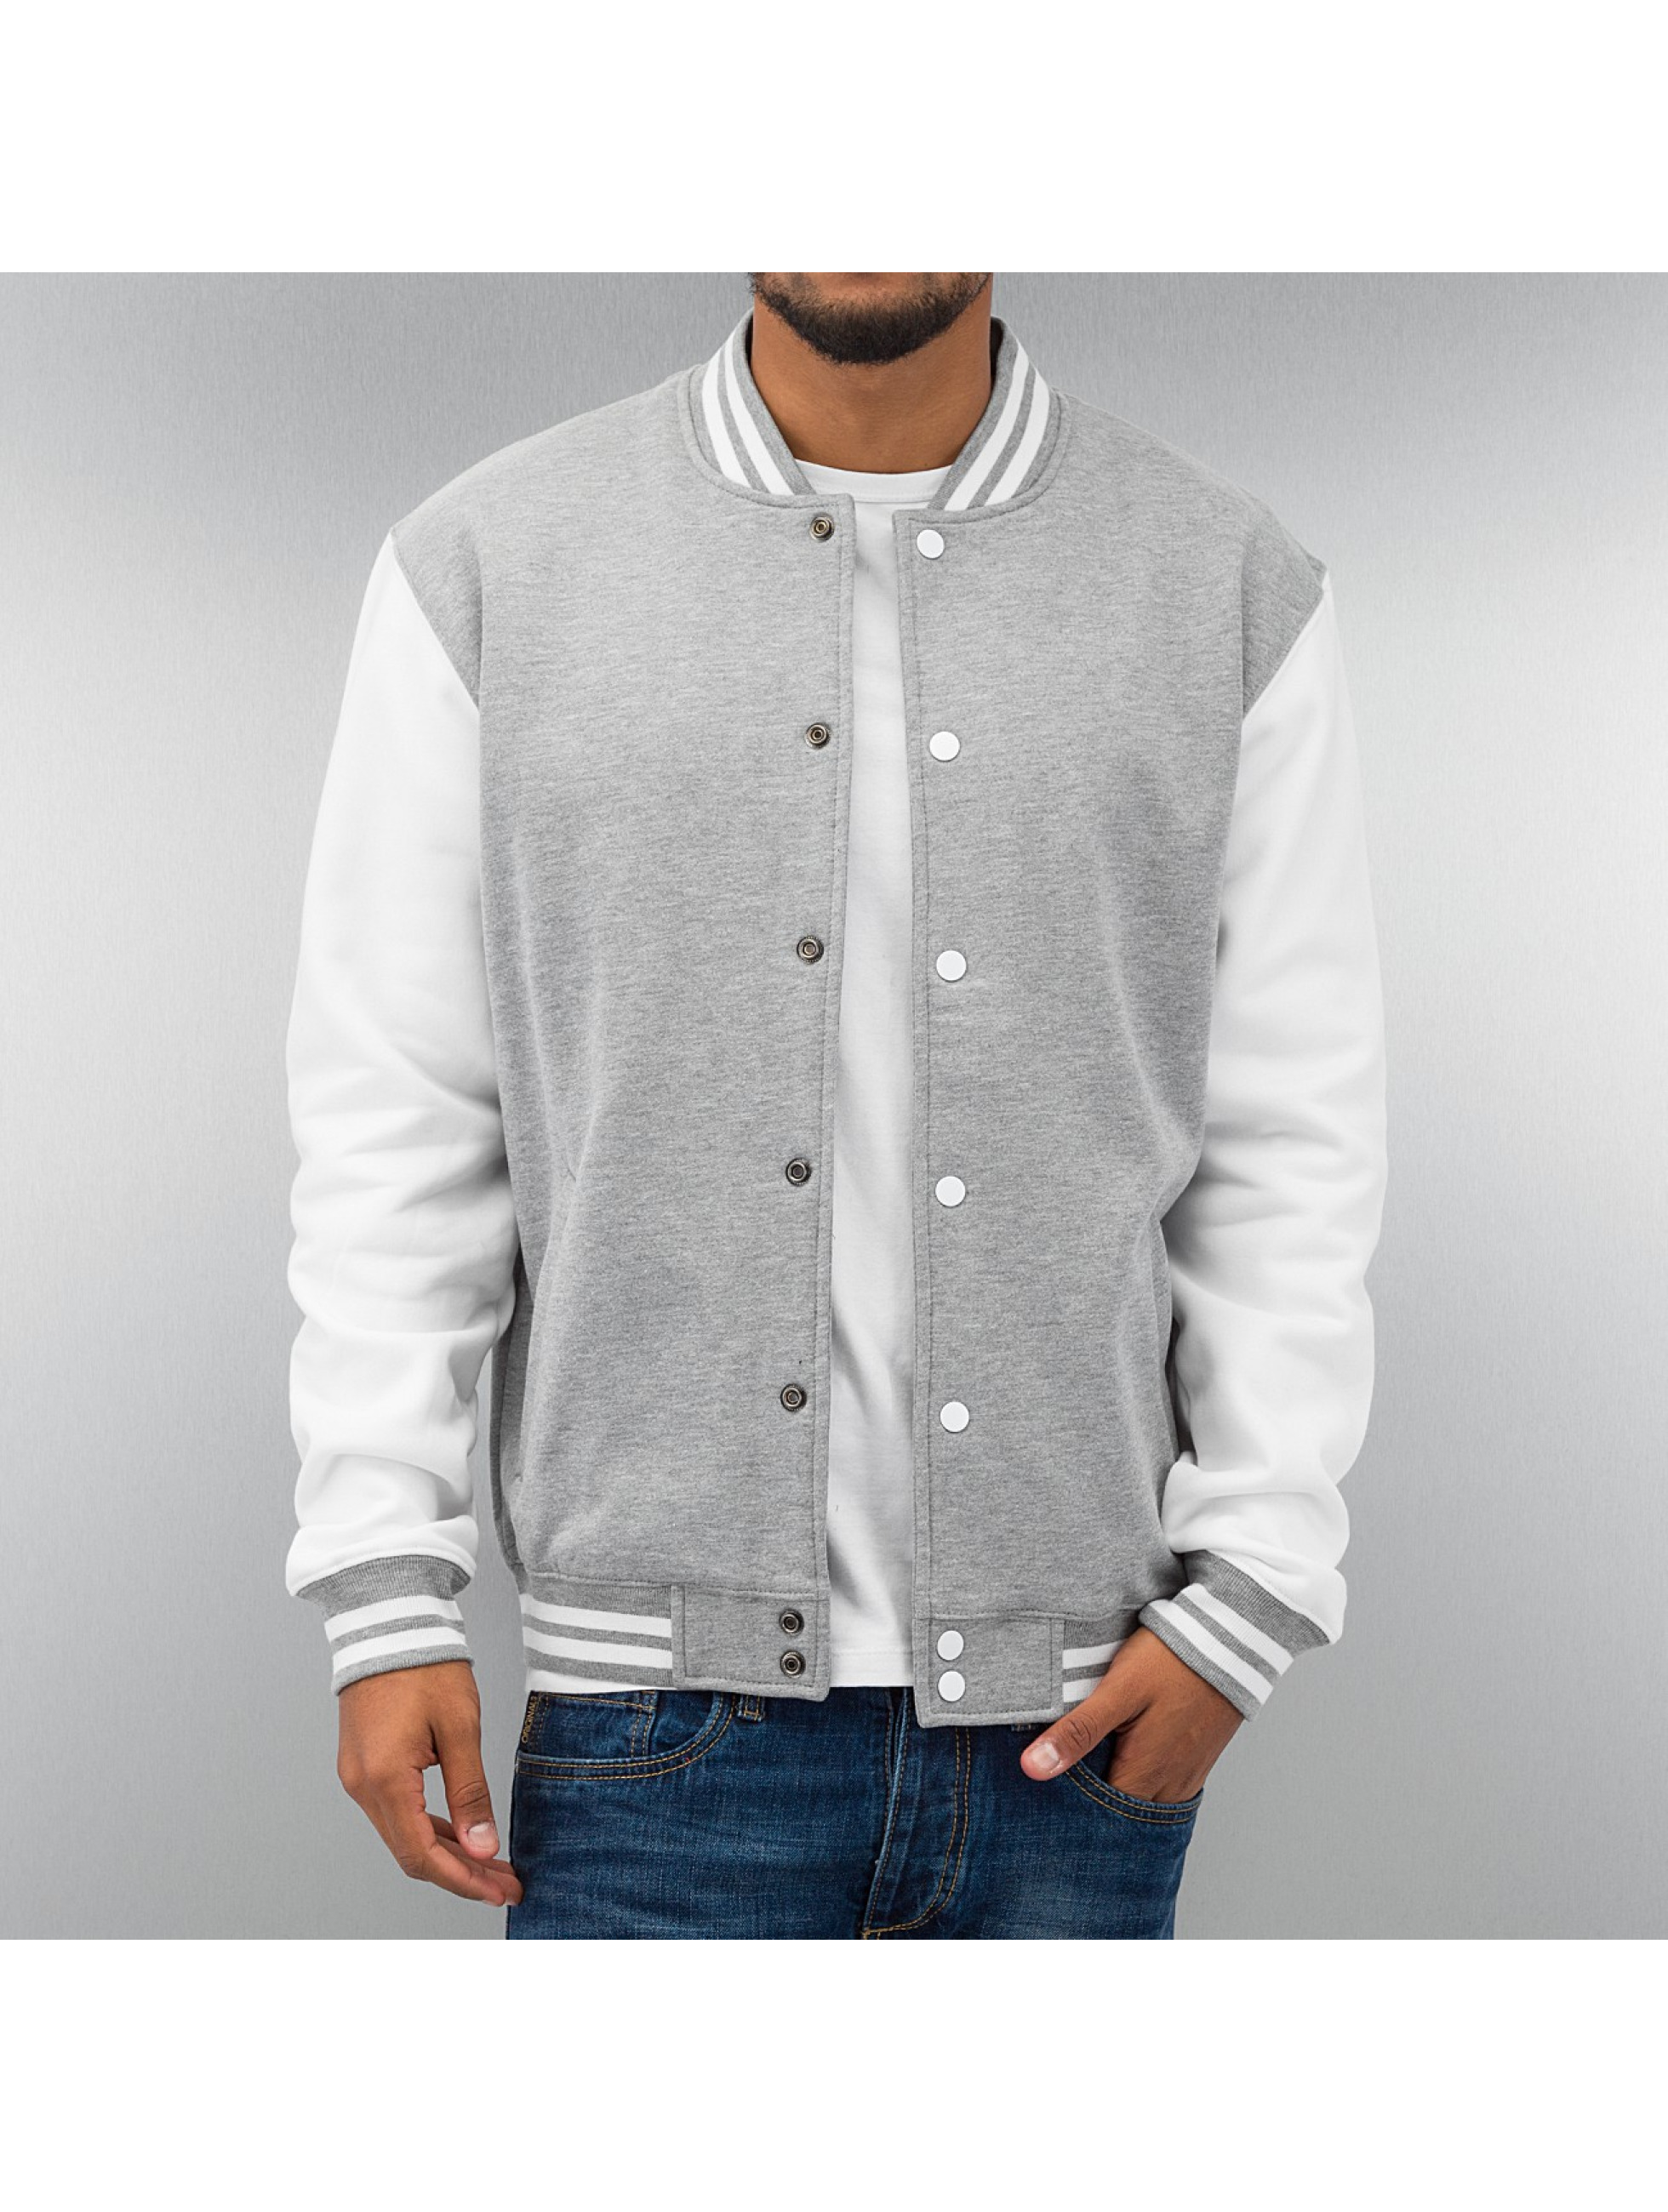 Urban Classics Veste/Blouson / Blouson Teddy 2-Tone College Sweatjacket en gris